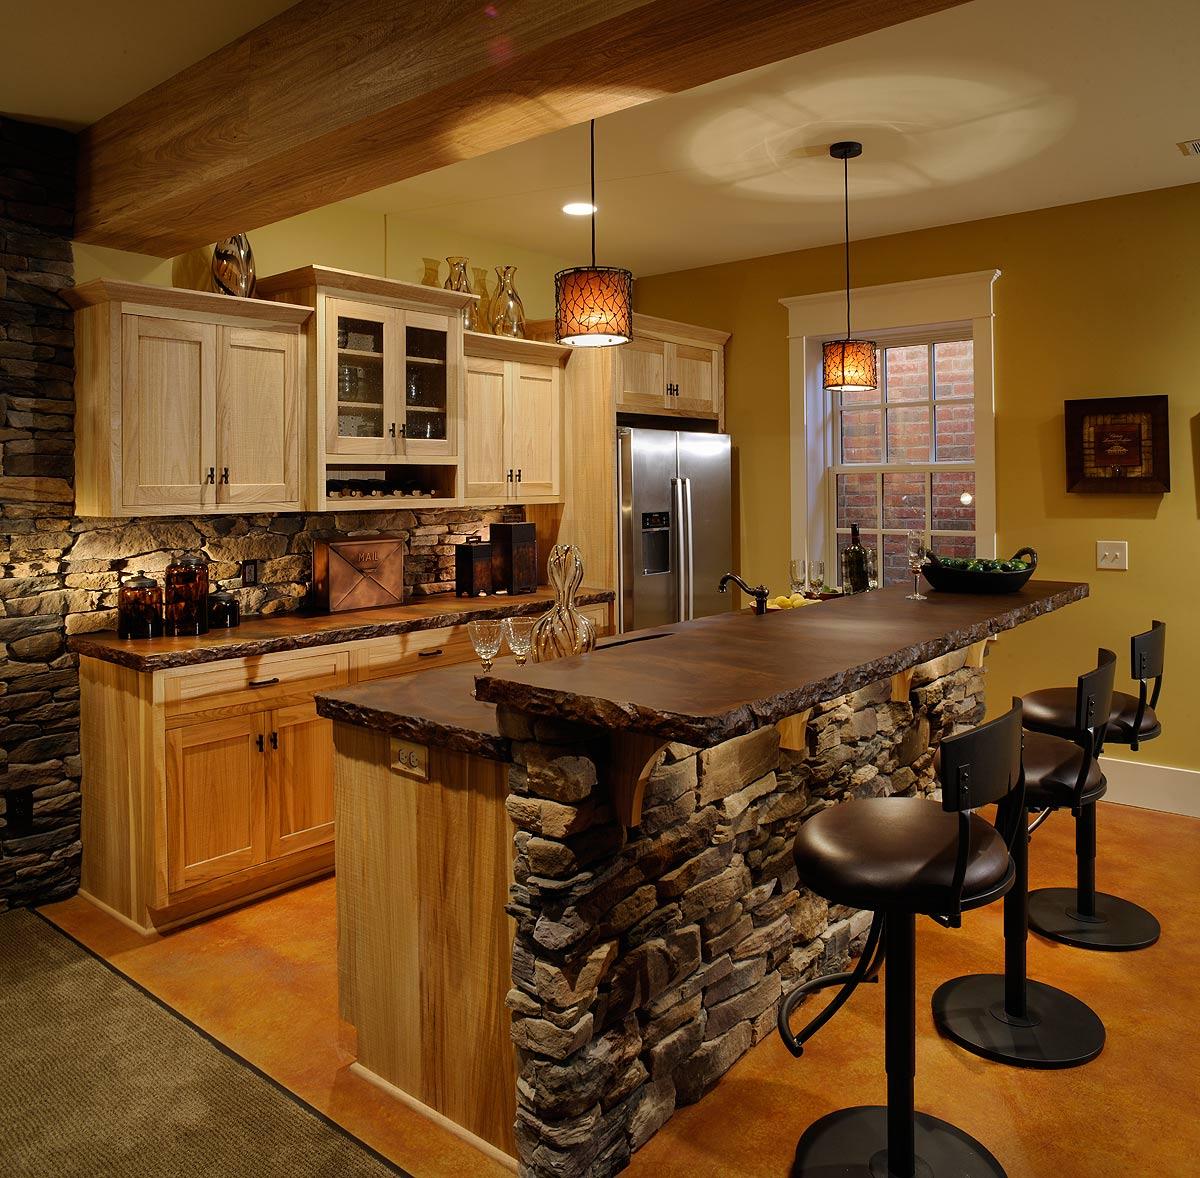 Rustic Cabin Living Room: Mullet Cabinet Cabin Room Wet Bar